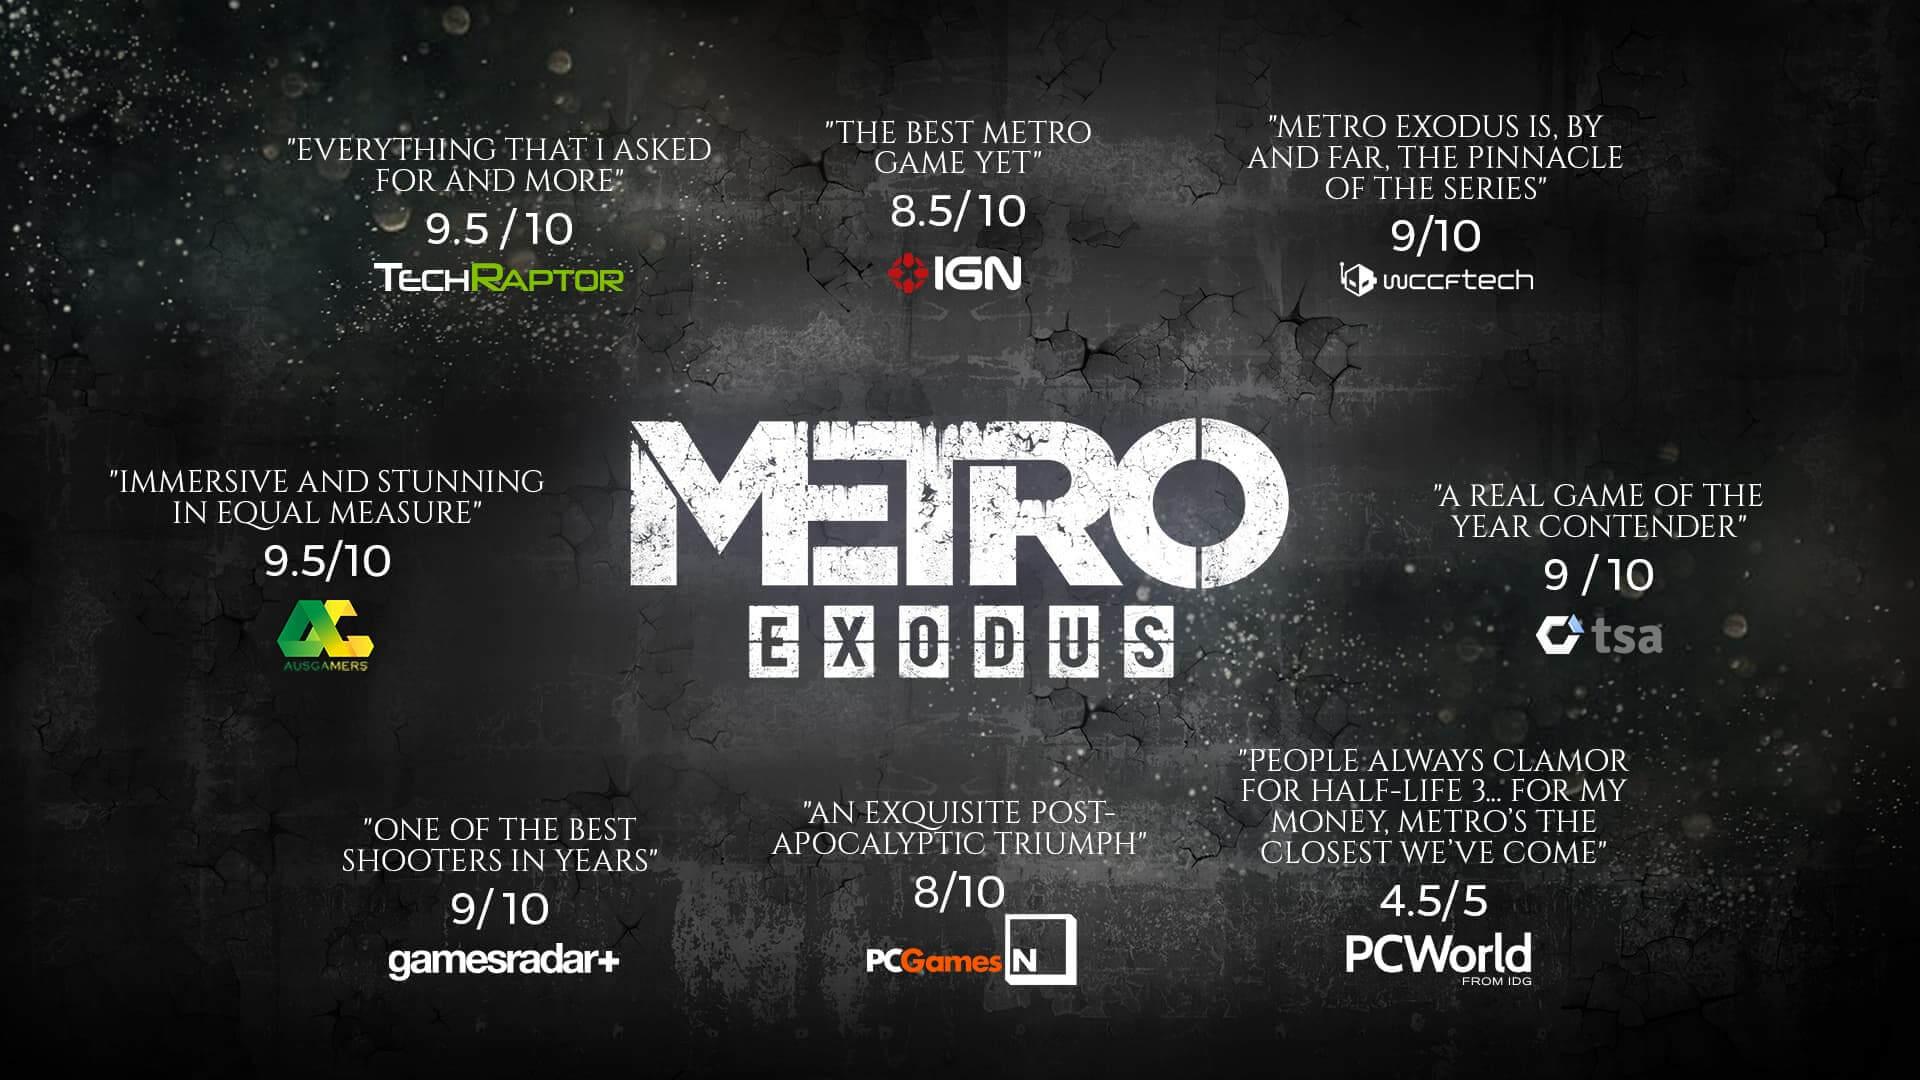 Metro Exodus Gold : Standard Edition + Expansion Pass PC (Epic Games)